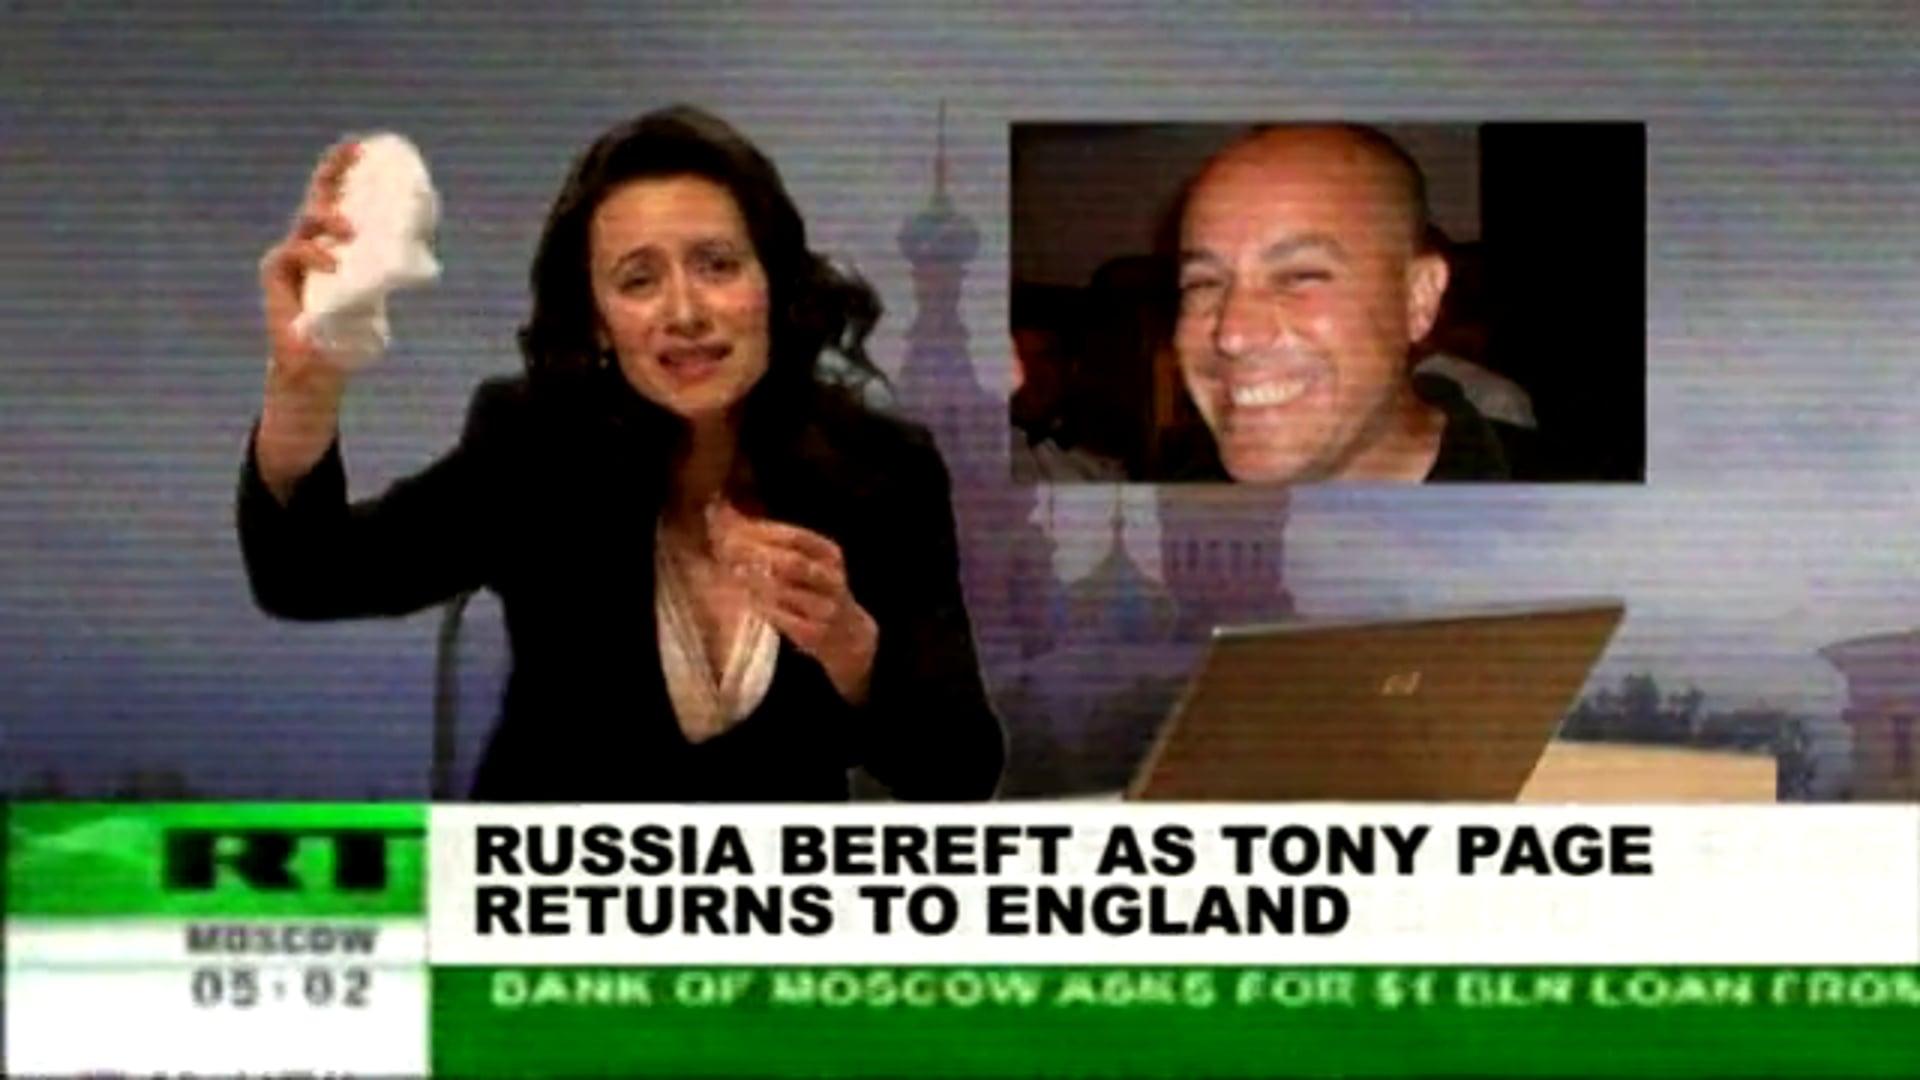 Lloyds Spoof Russian Newscast